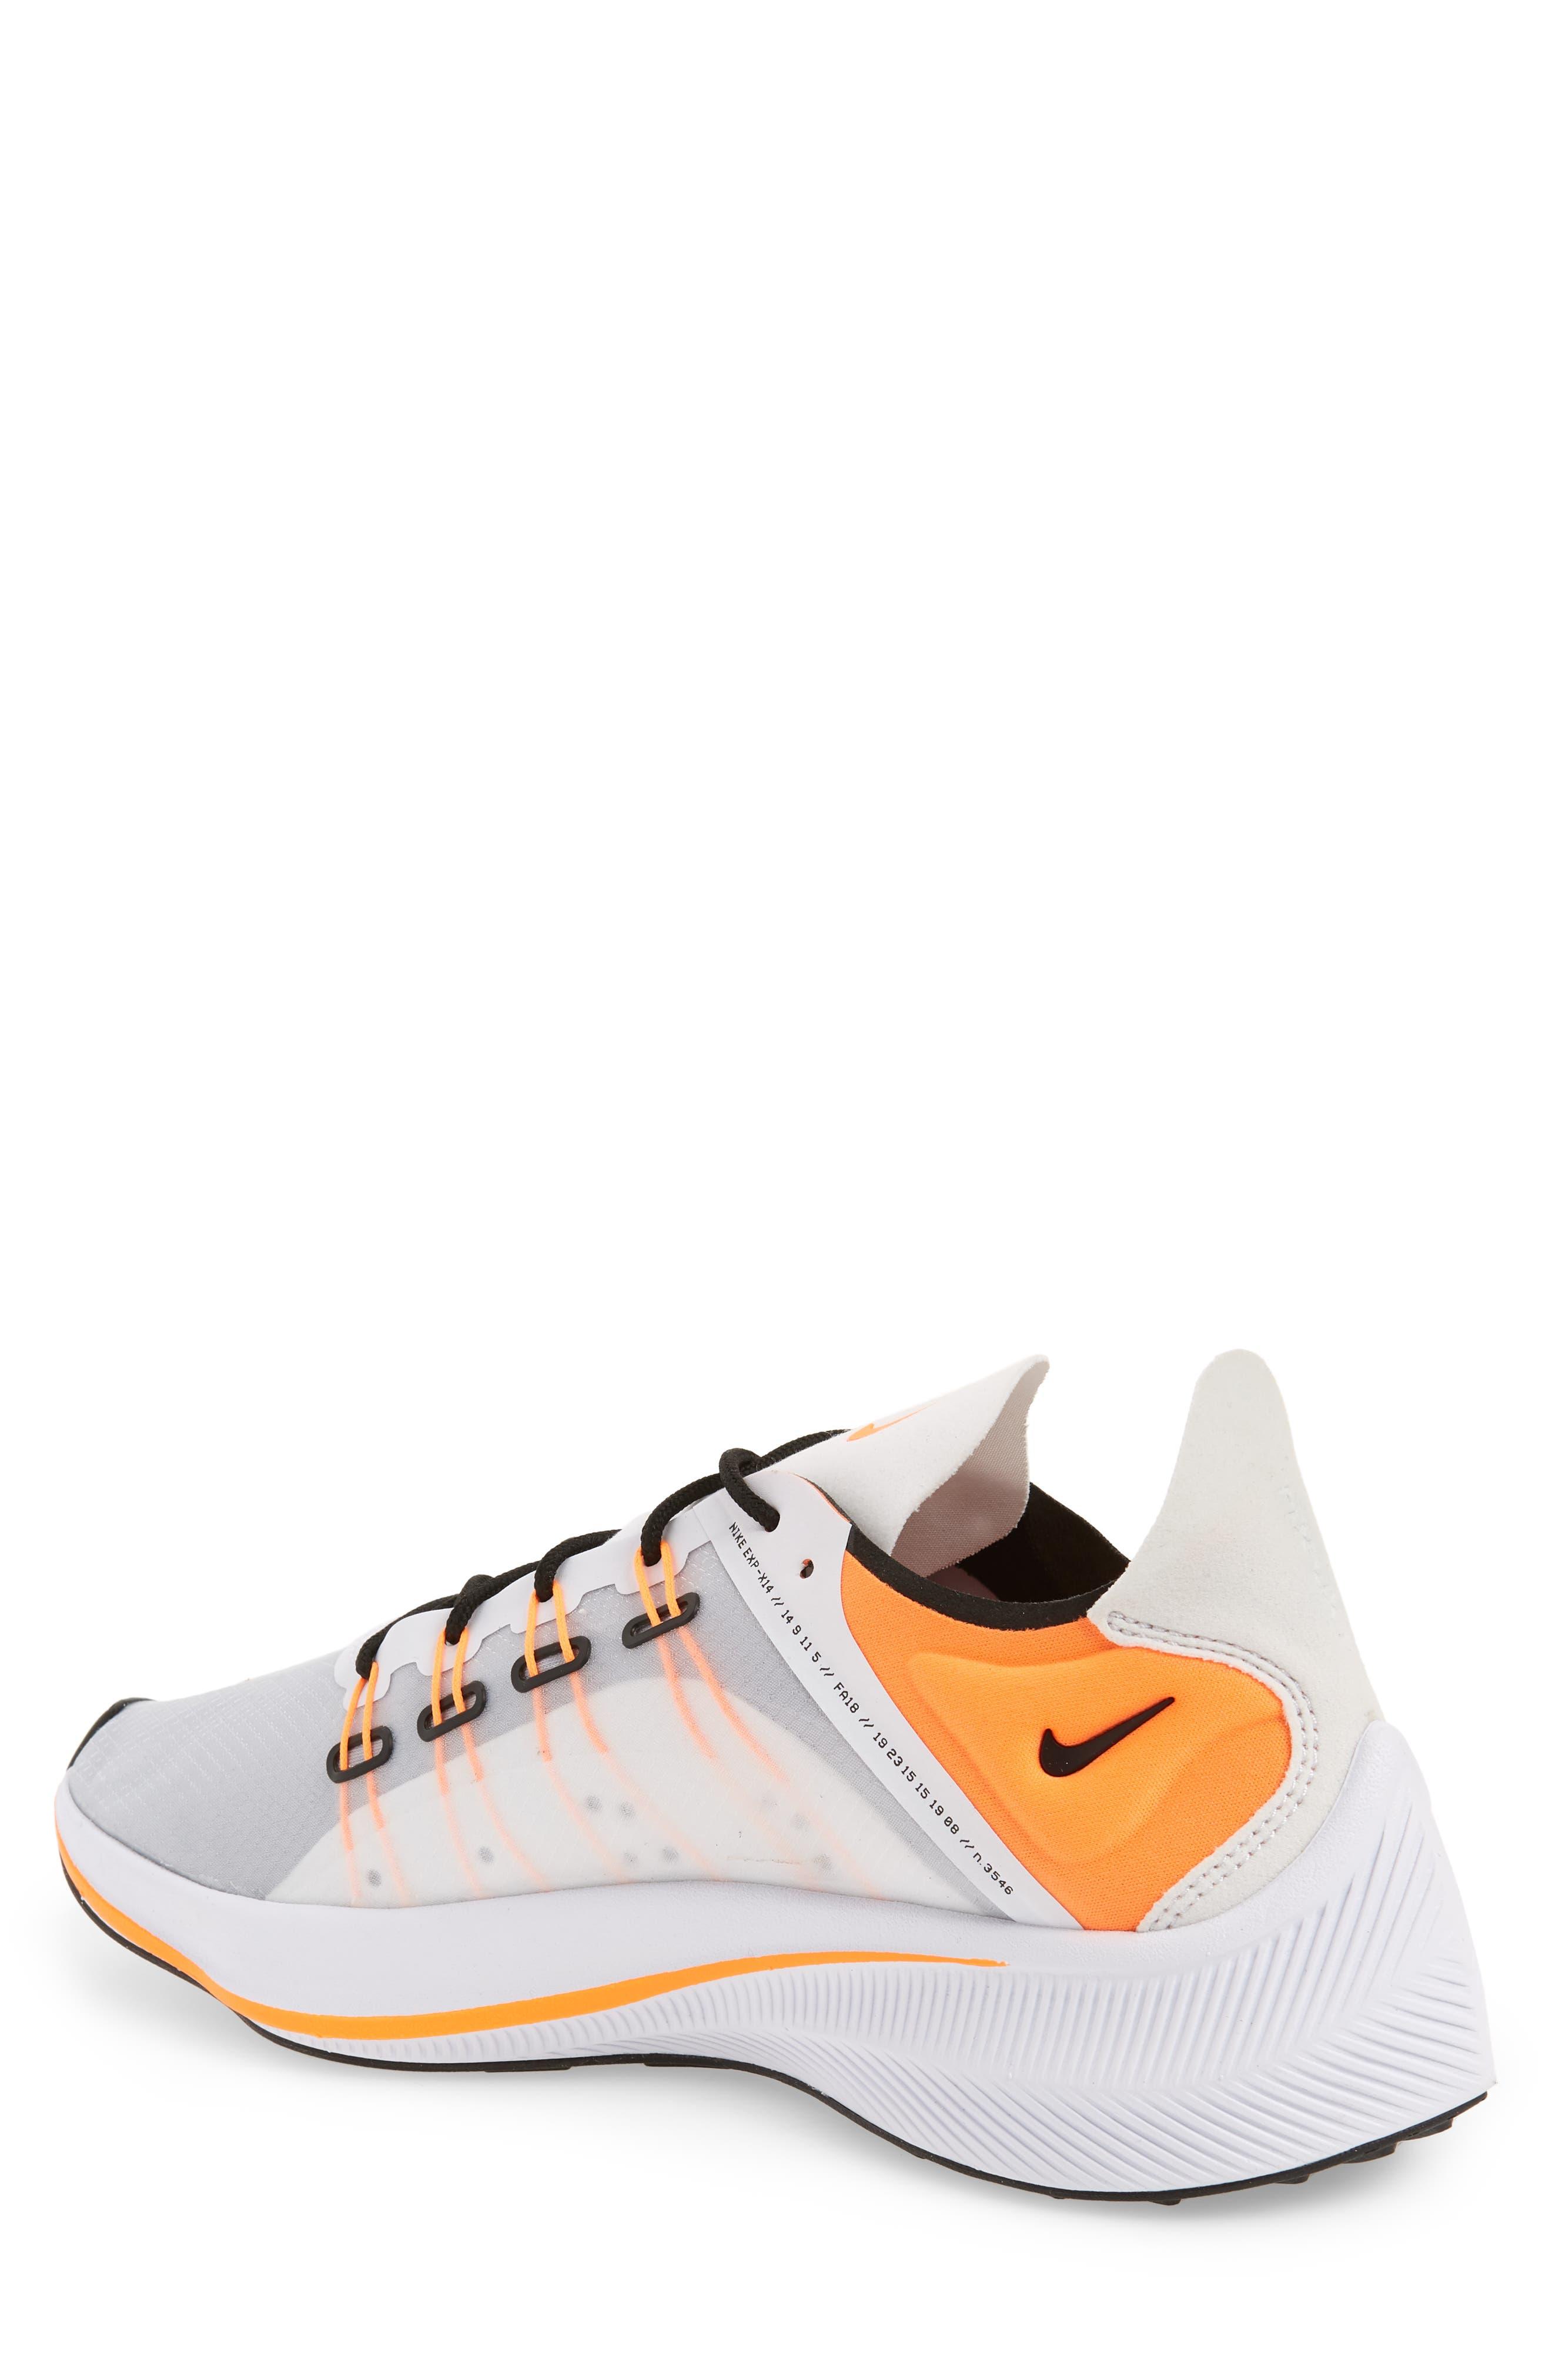 EXP-X14 Just Do It Sneaker,                             Alternate thumbnail 2, color,                             WHITE/ TOTAL ORANGE/ BLACK